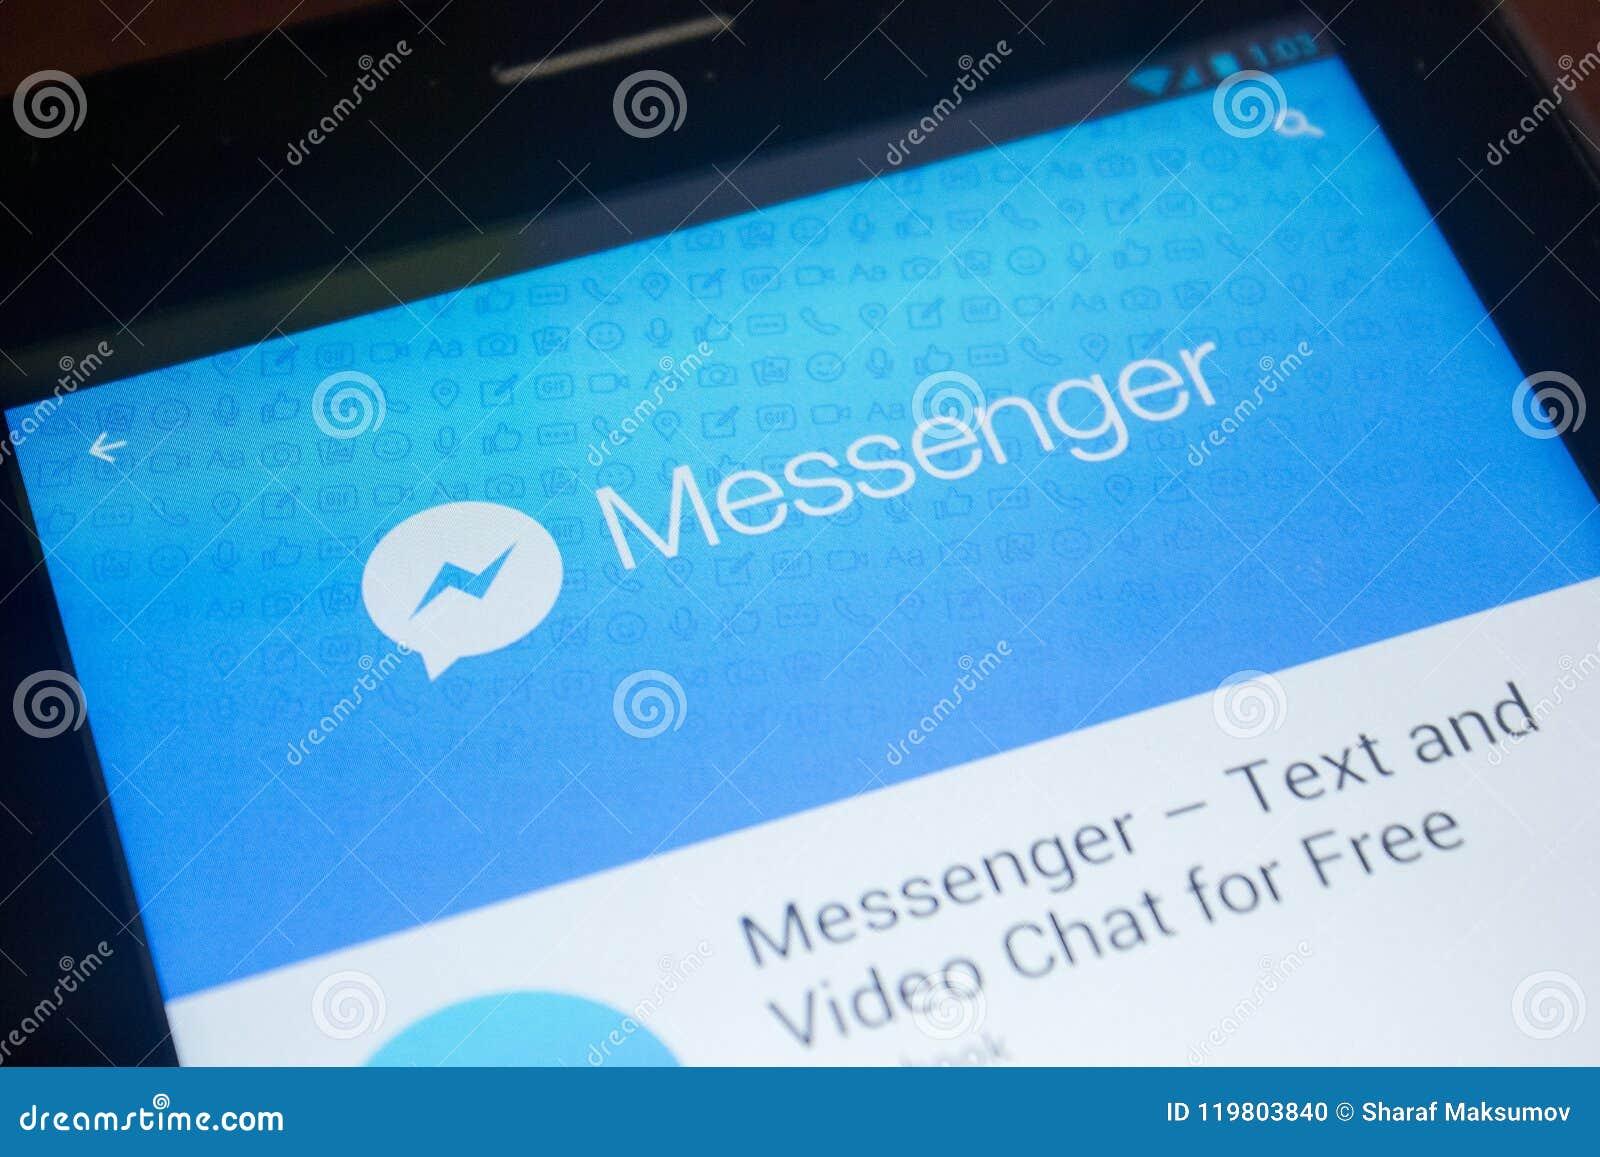 Russian chat messenger